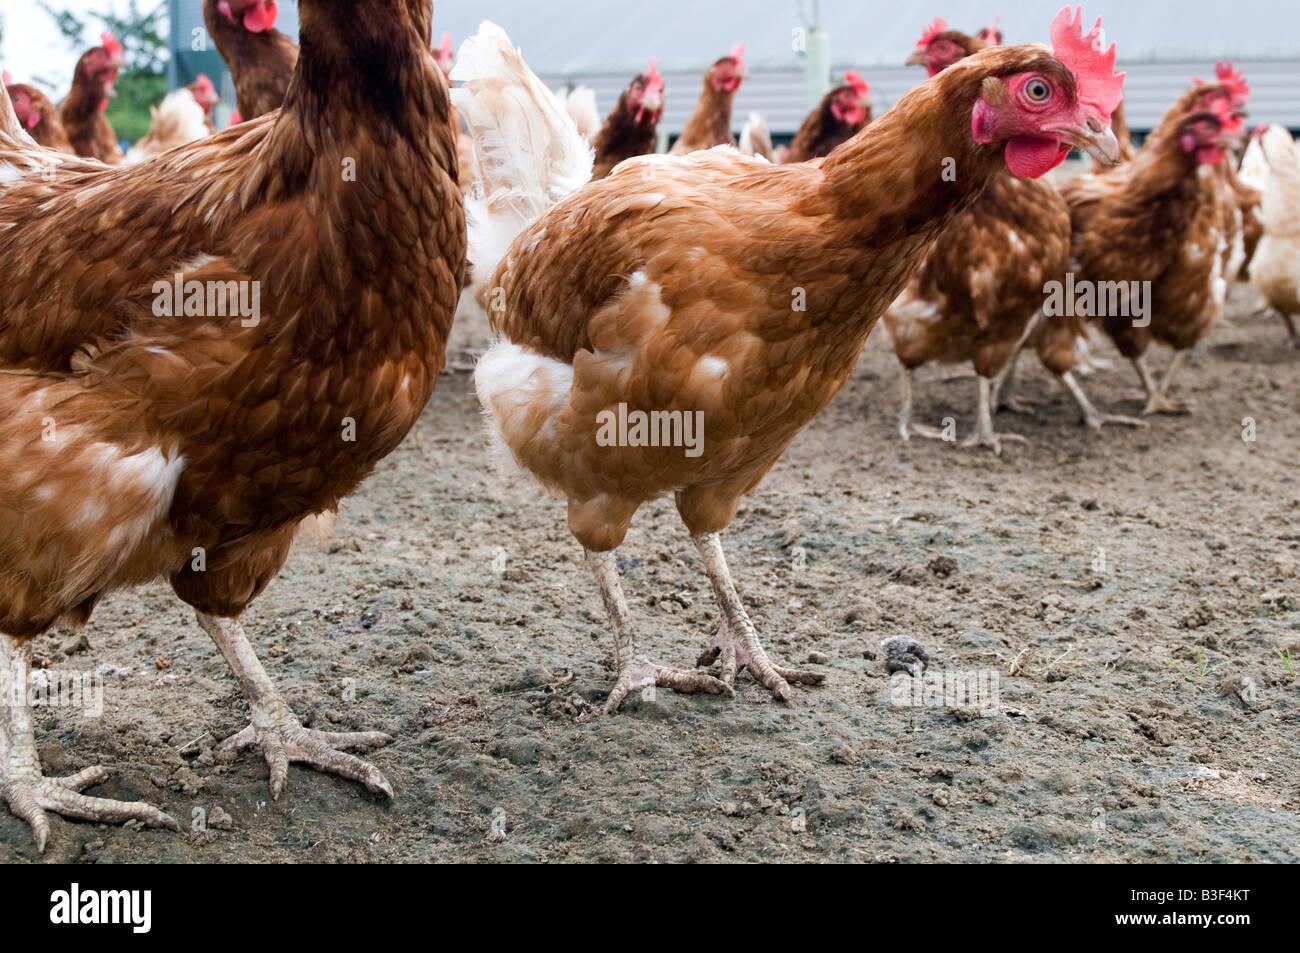 Freerange chicken chickens hen hens poultry free range eggs farming farmer farm bird birds food production shed - Stock Image